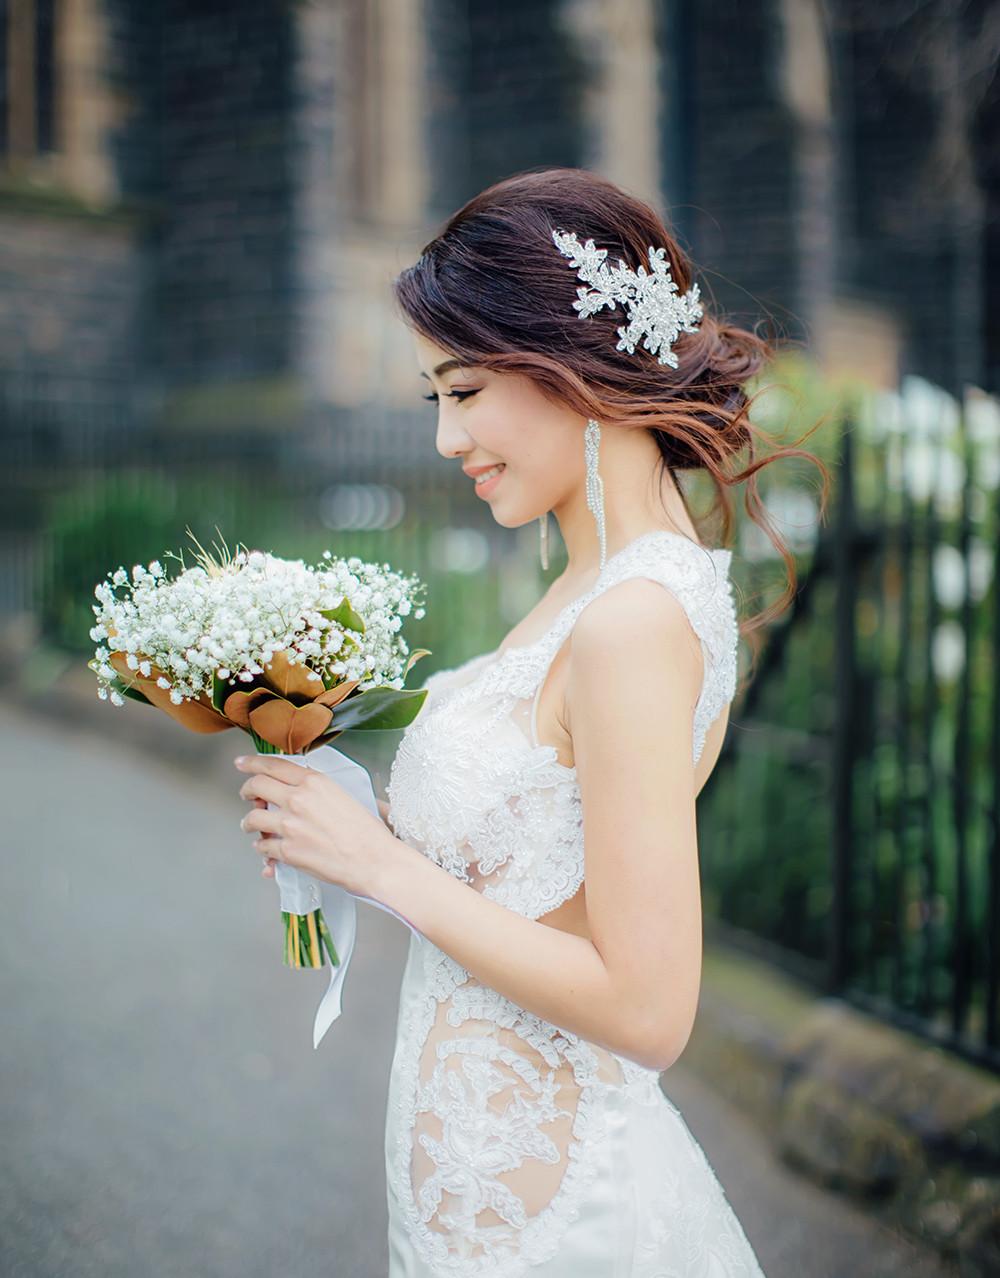 prewedding photoshoot